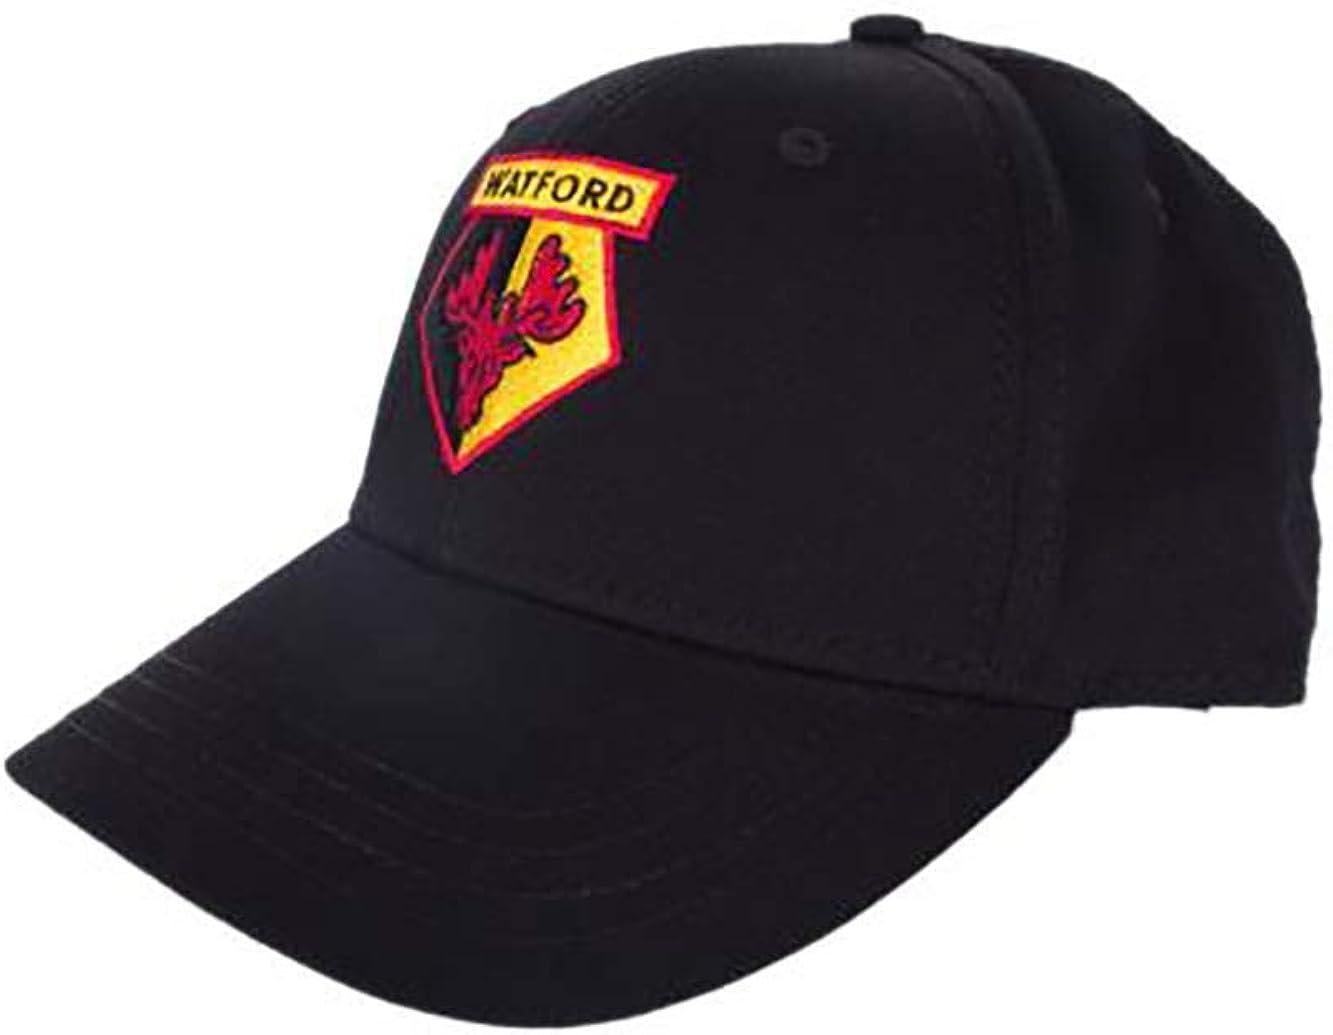 Official Licensed Watford F.C - Adult Baseball Cap